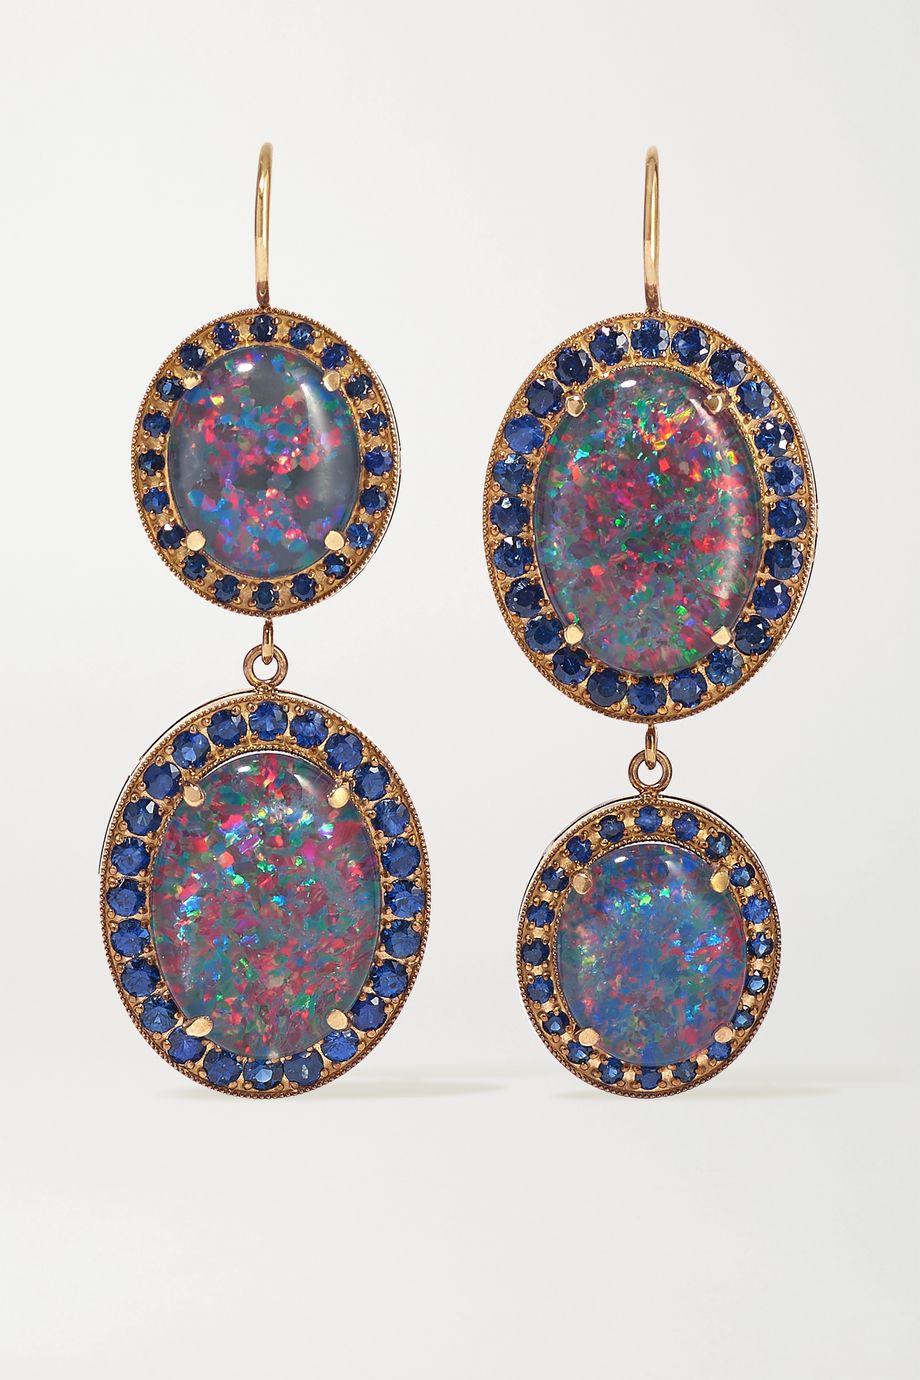 Andrea Fohrman 18-karat rose gold, opal doublets and sapphire earrings